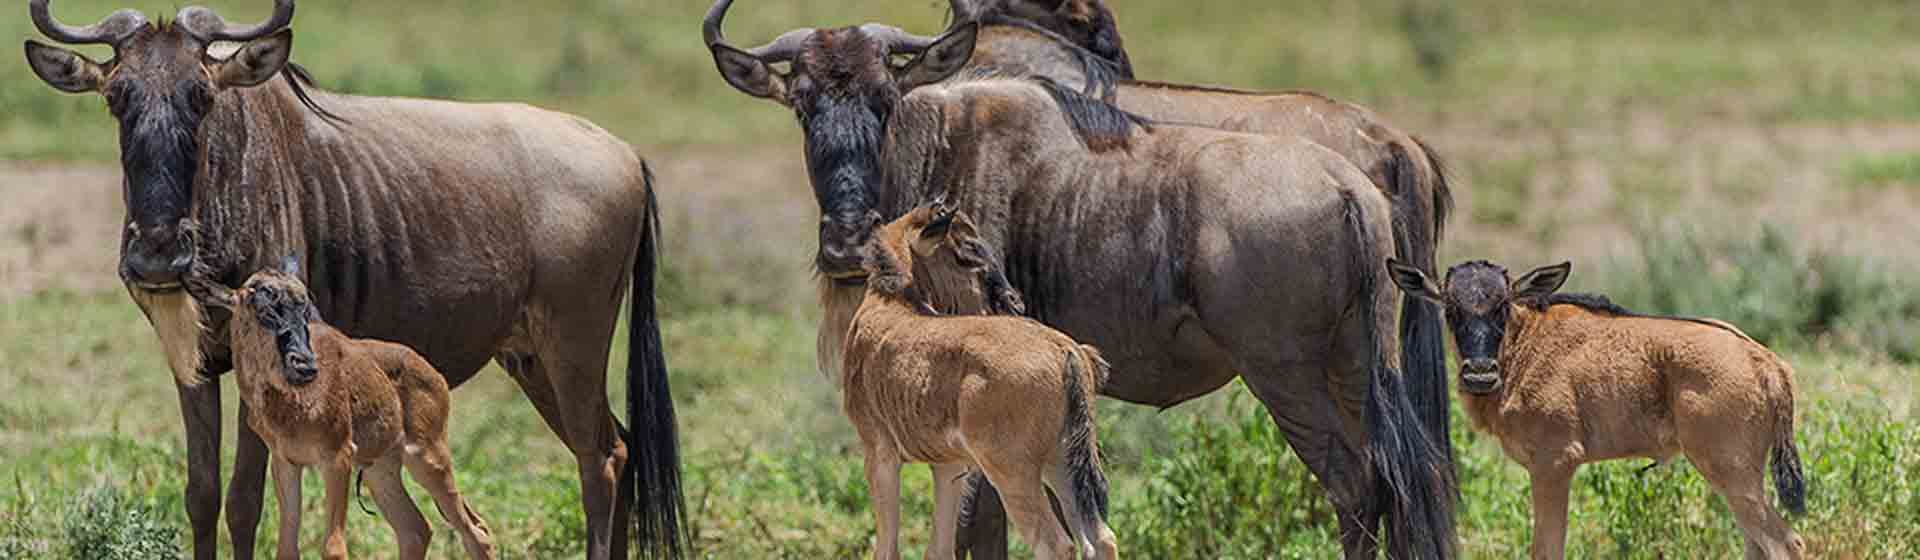 wildebeest calving in Southern Serengeti - Ndutu area